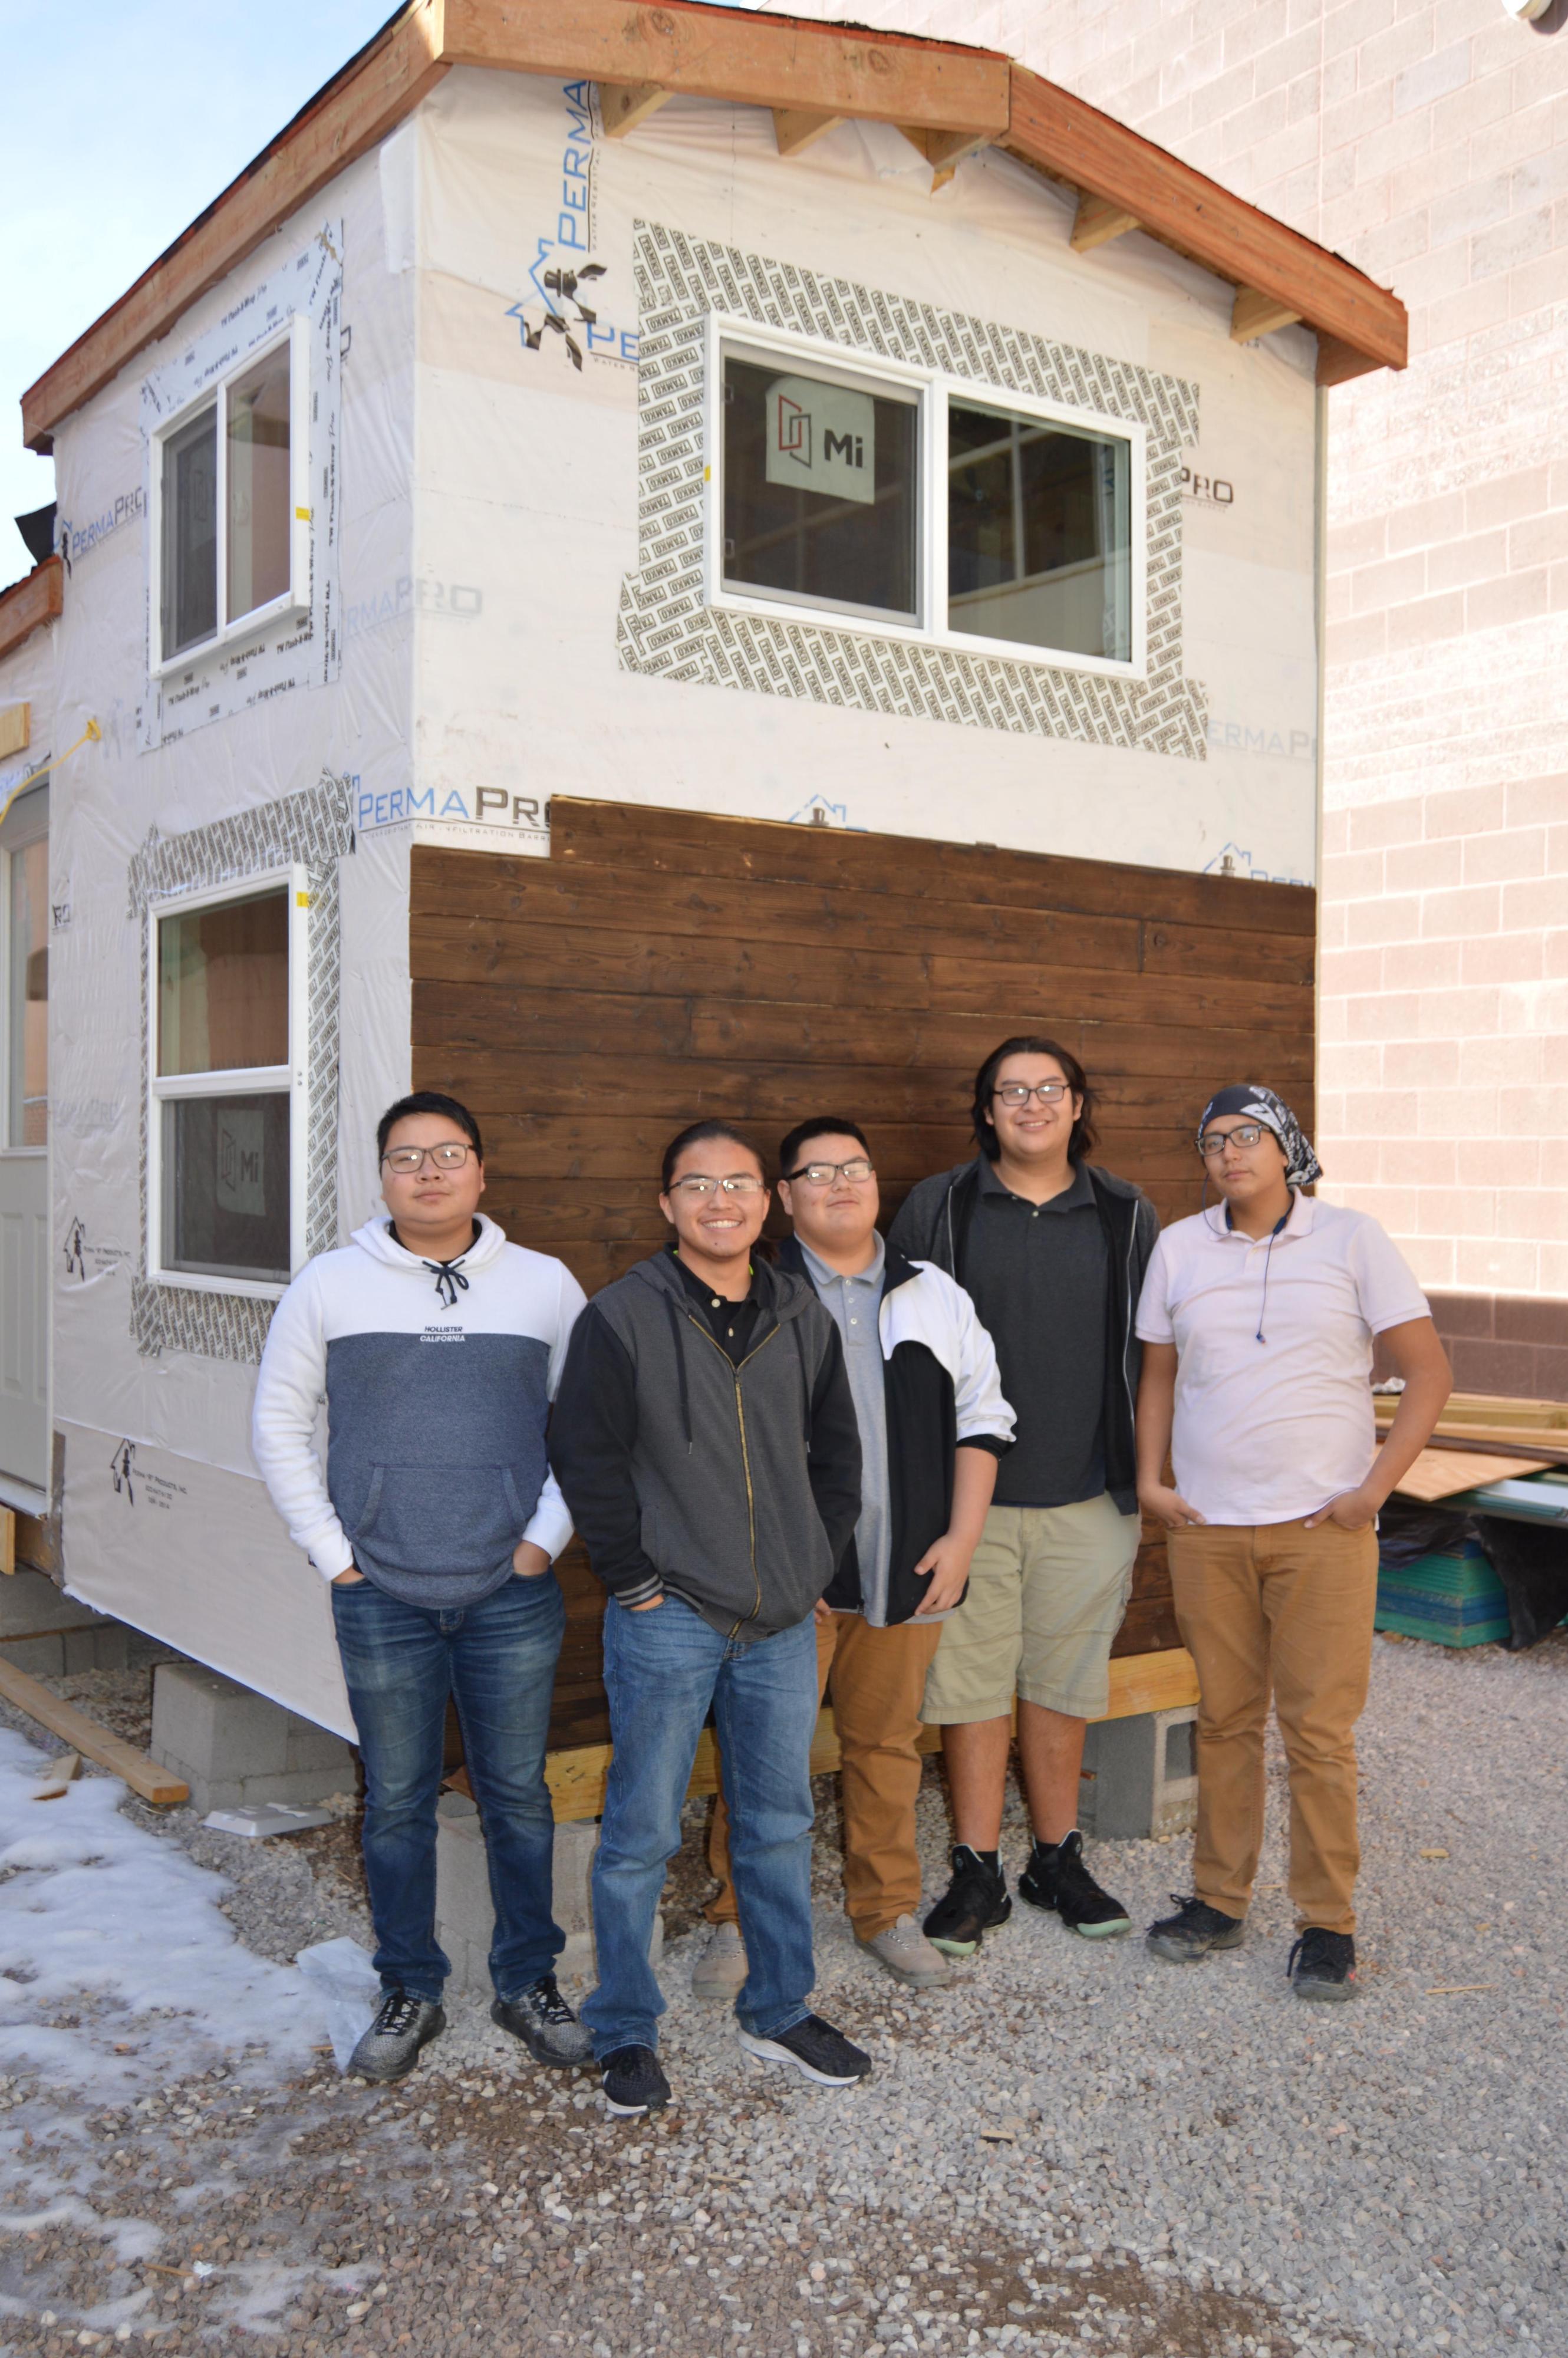 MHS Tiny House Builders